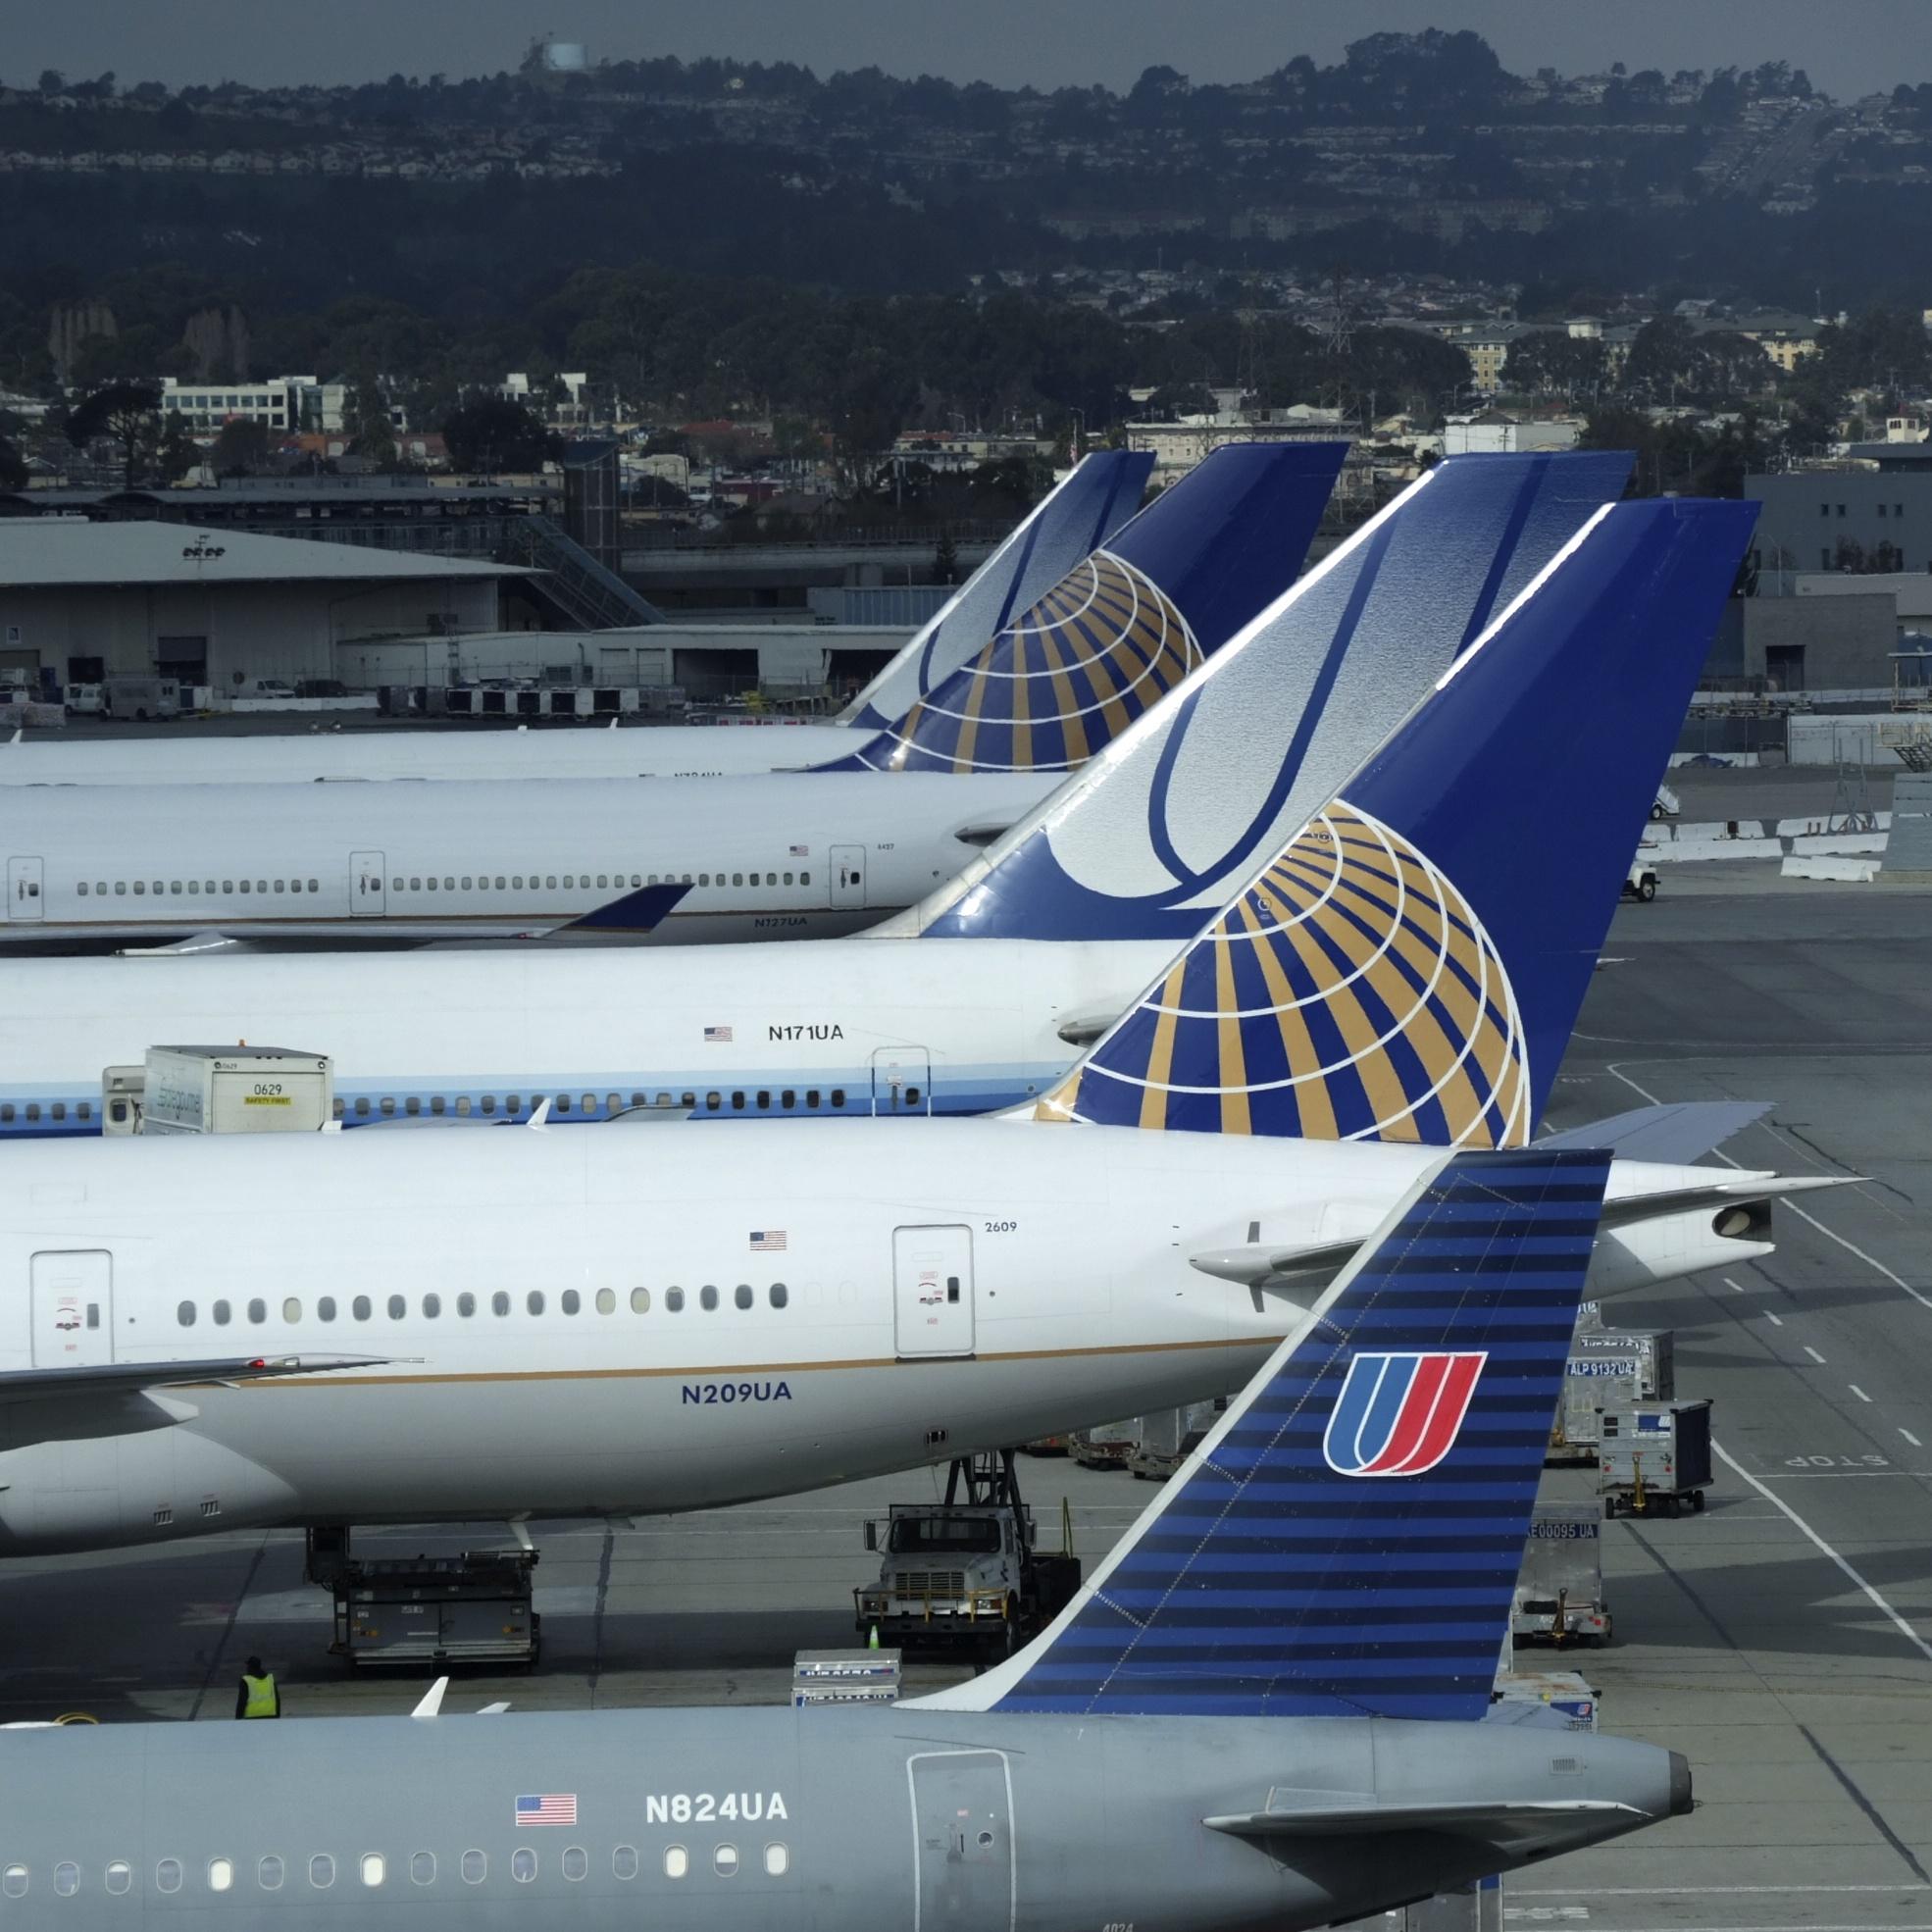 UPDATE 1-United Airlines suspends 2020 guidance on coronavirus uncertainty